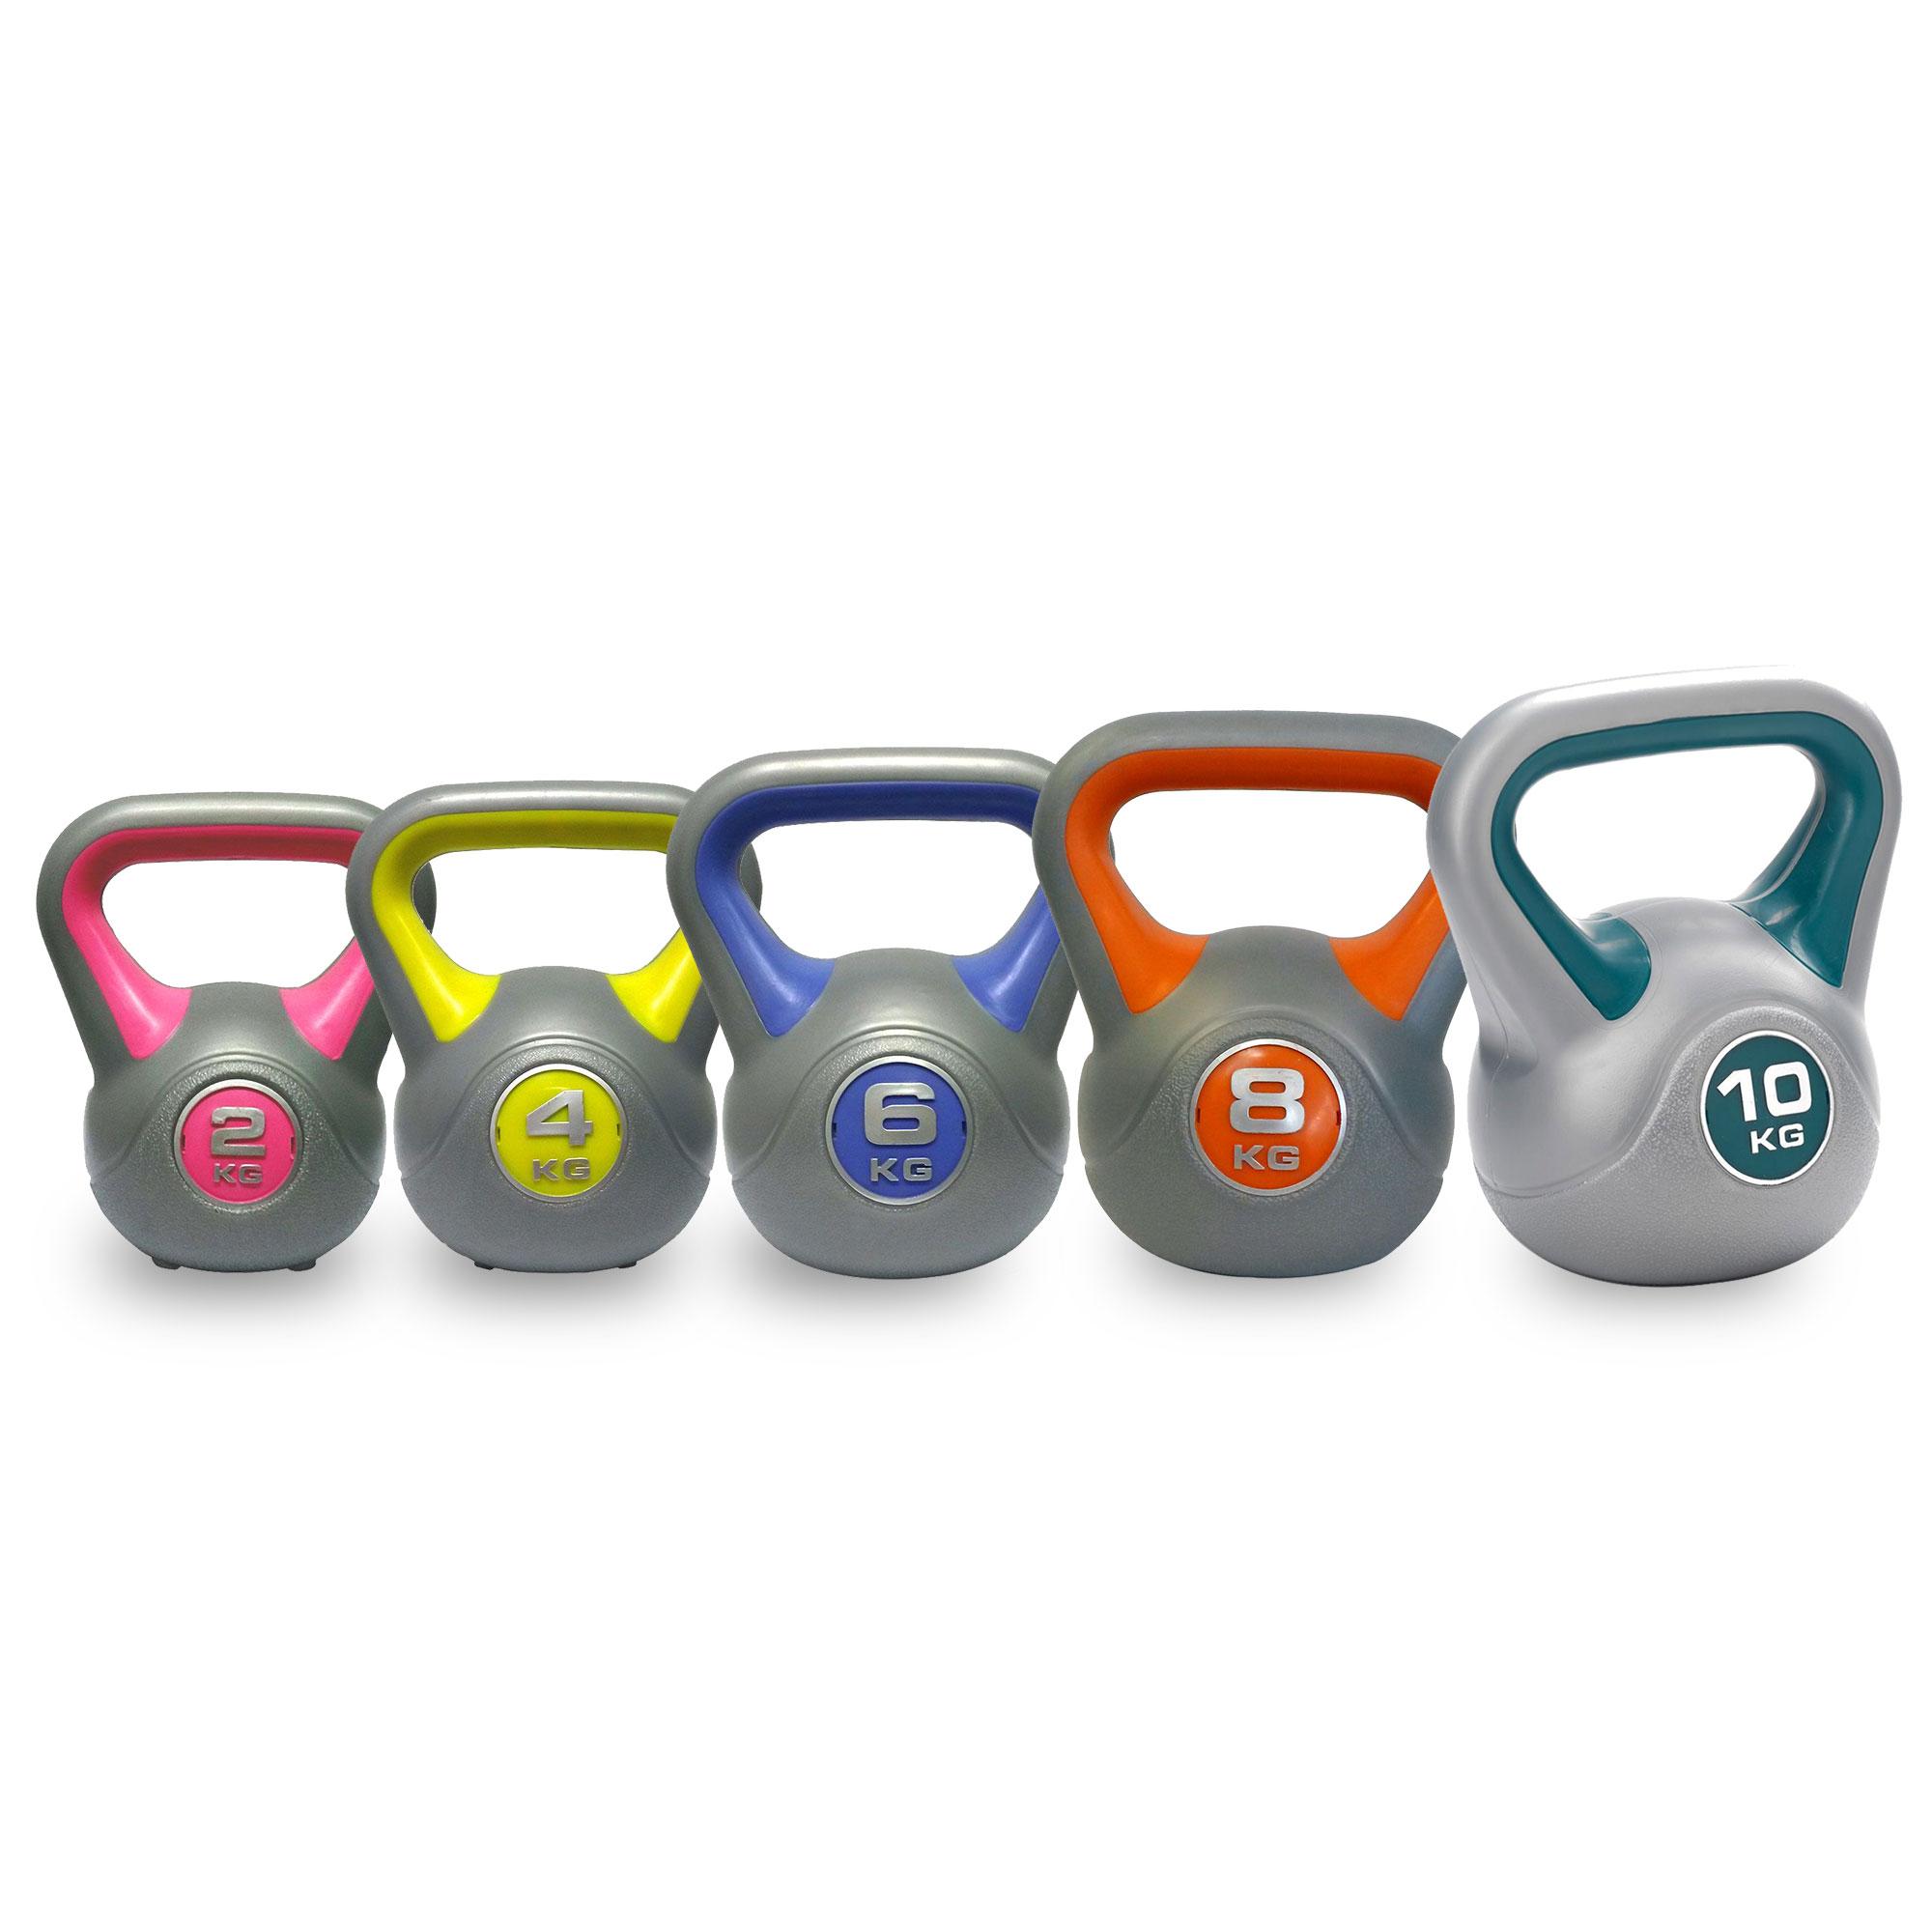 Fitness Equipment DKN 2, 4, 6, 8 and 10kg Vinyl Kettlebell Weight Set